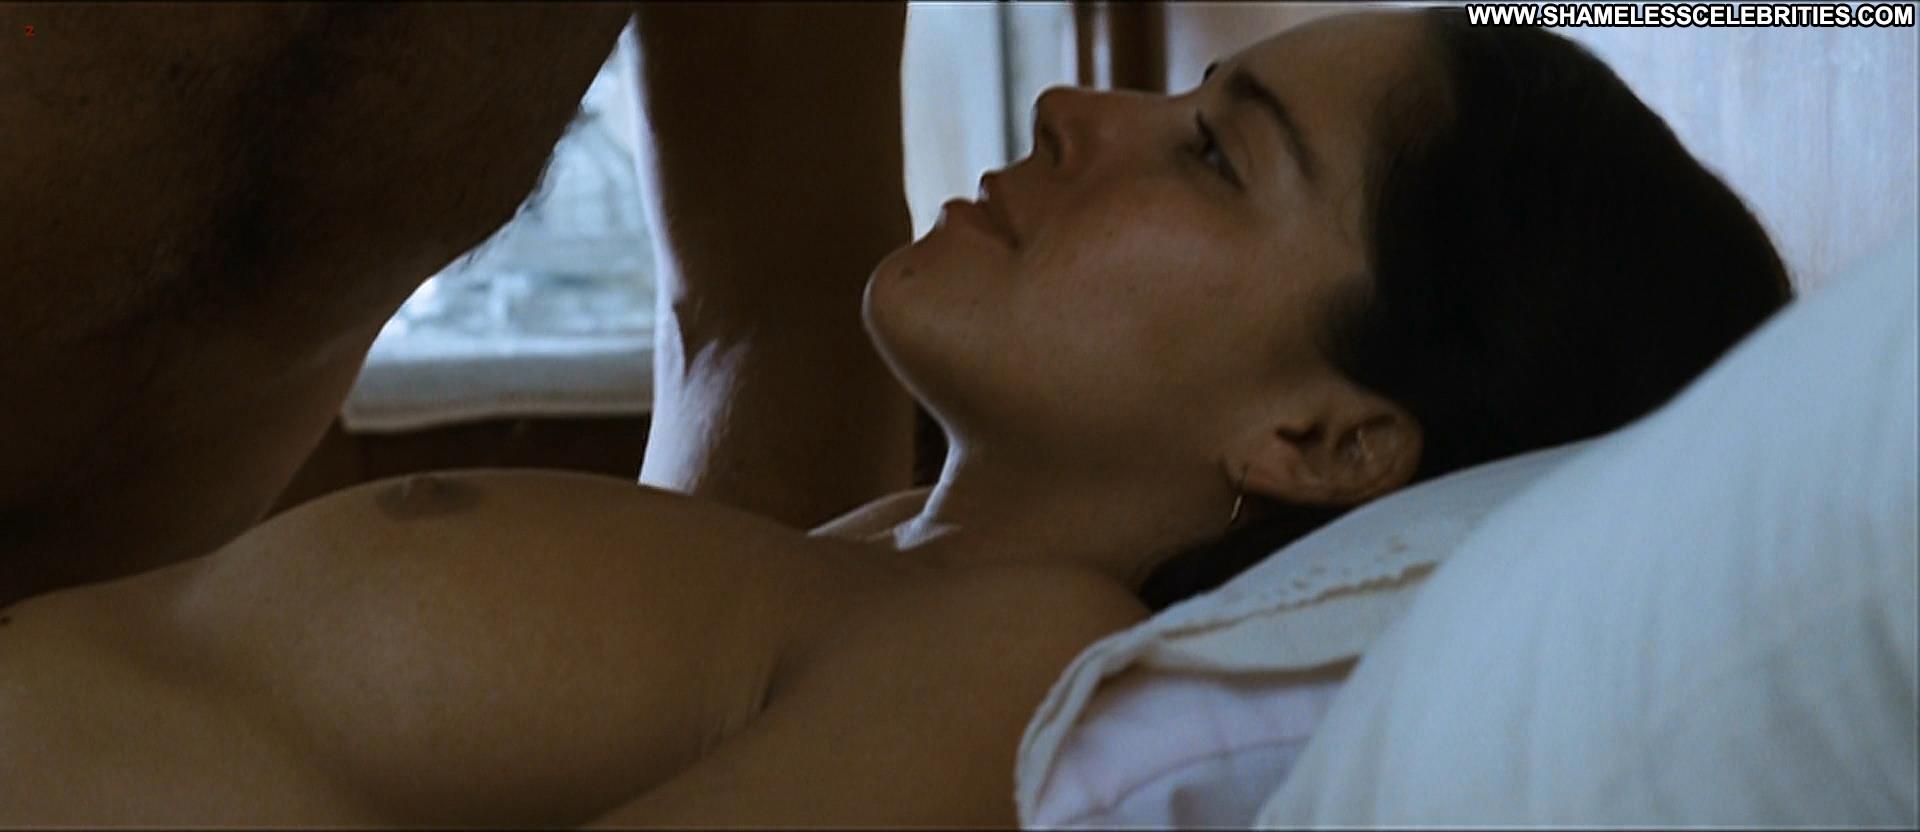 koria naked sex virgin